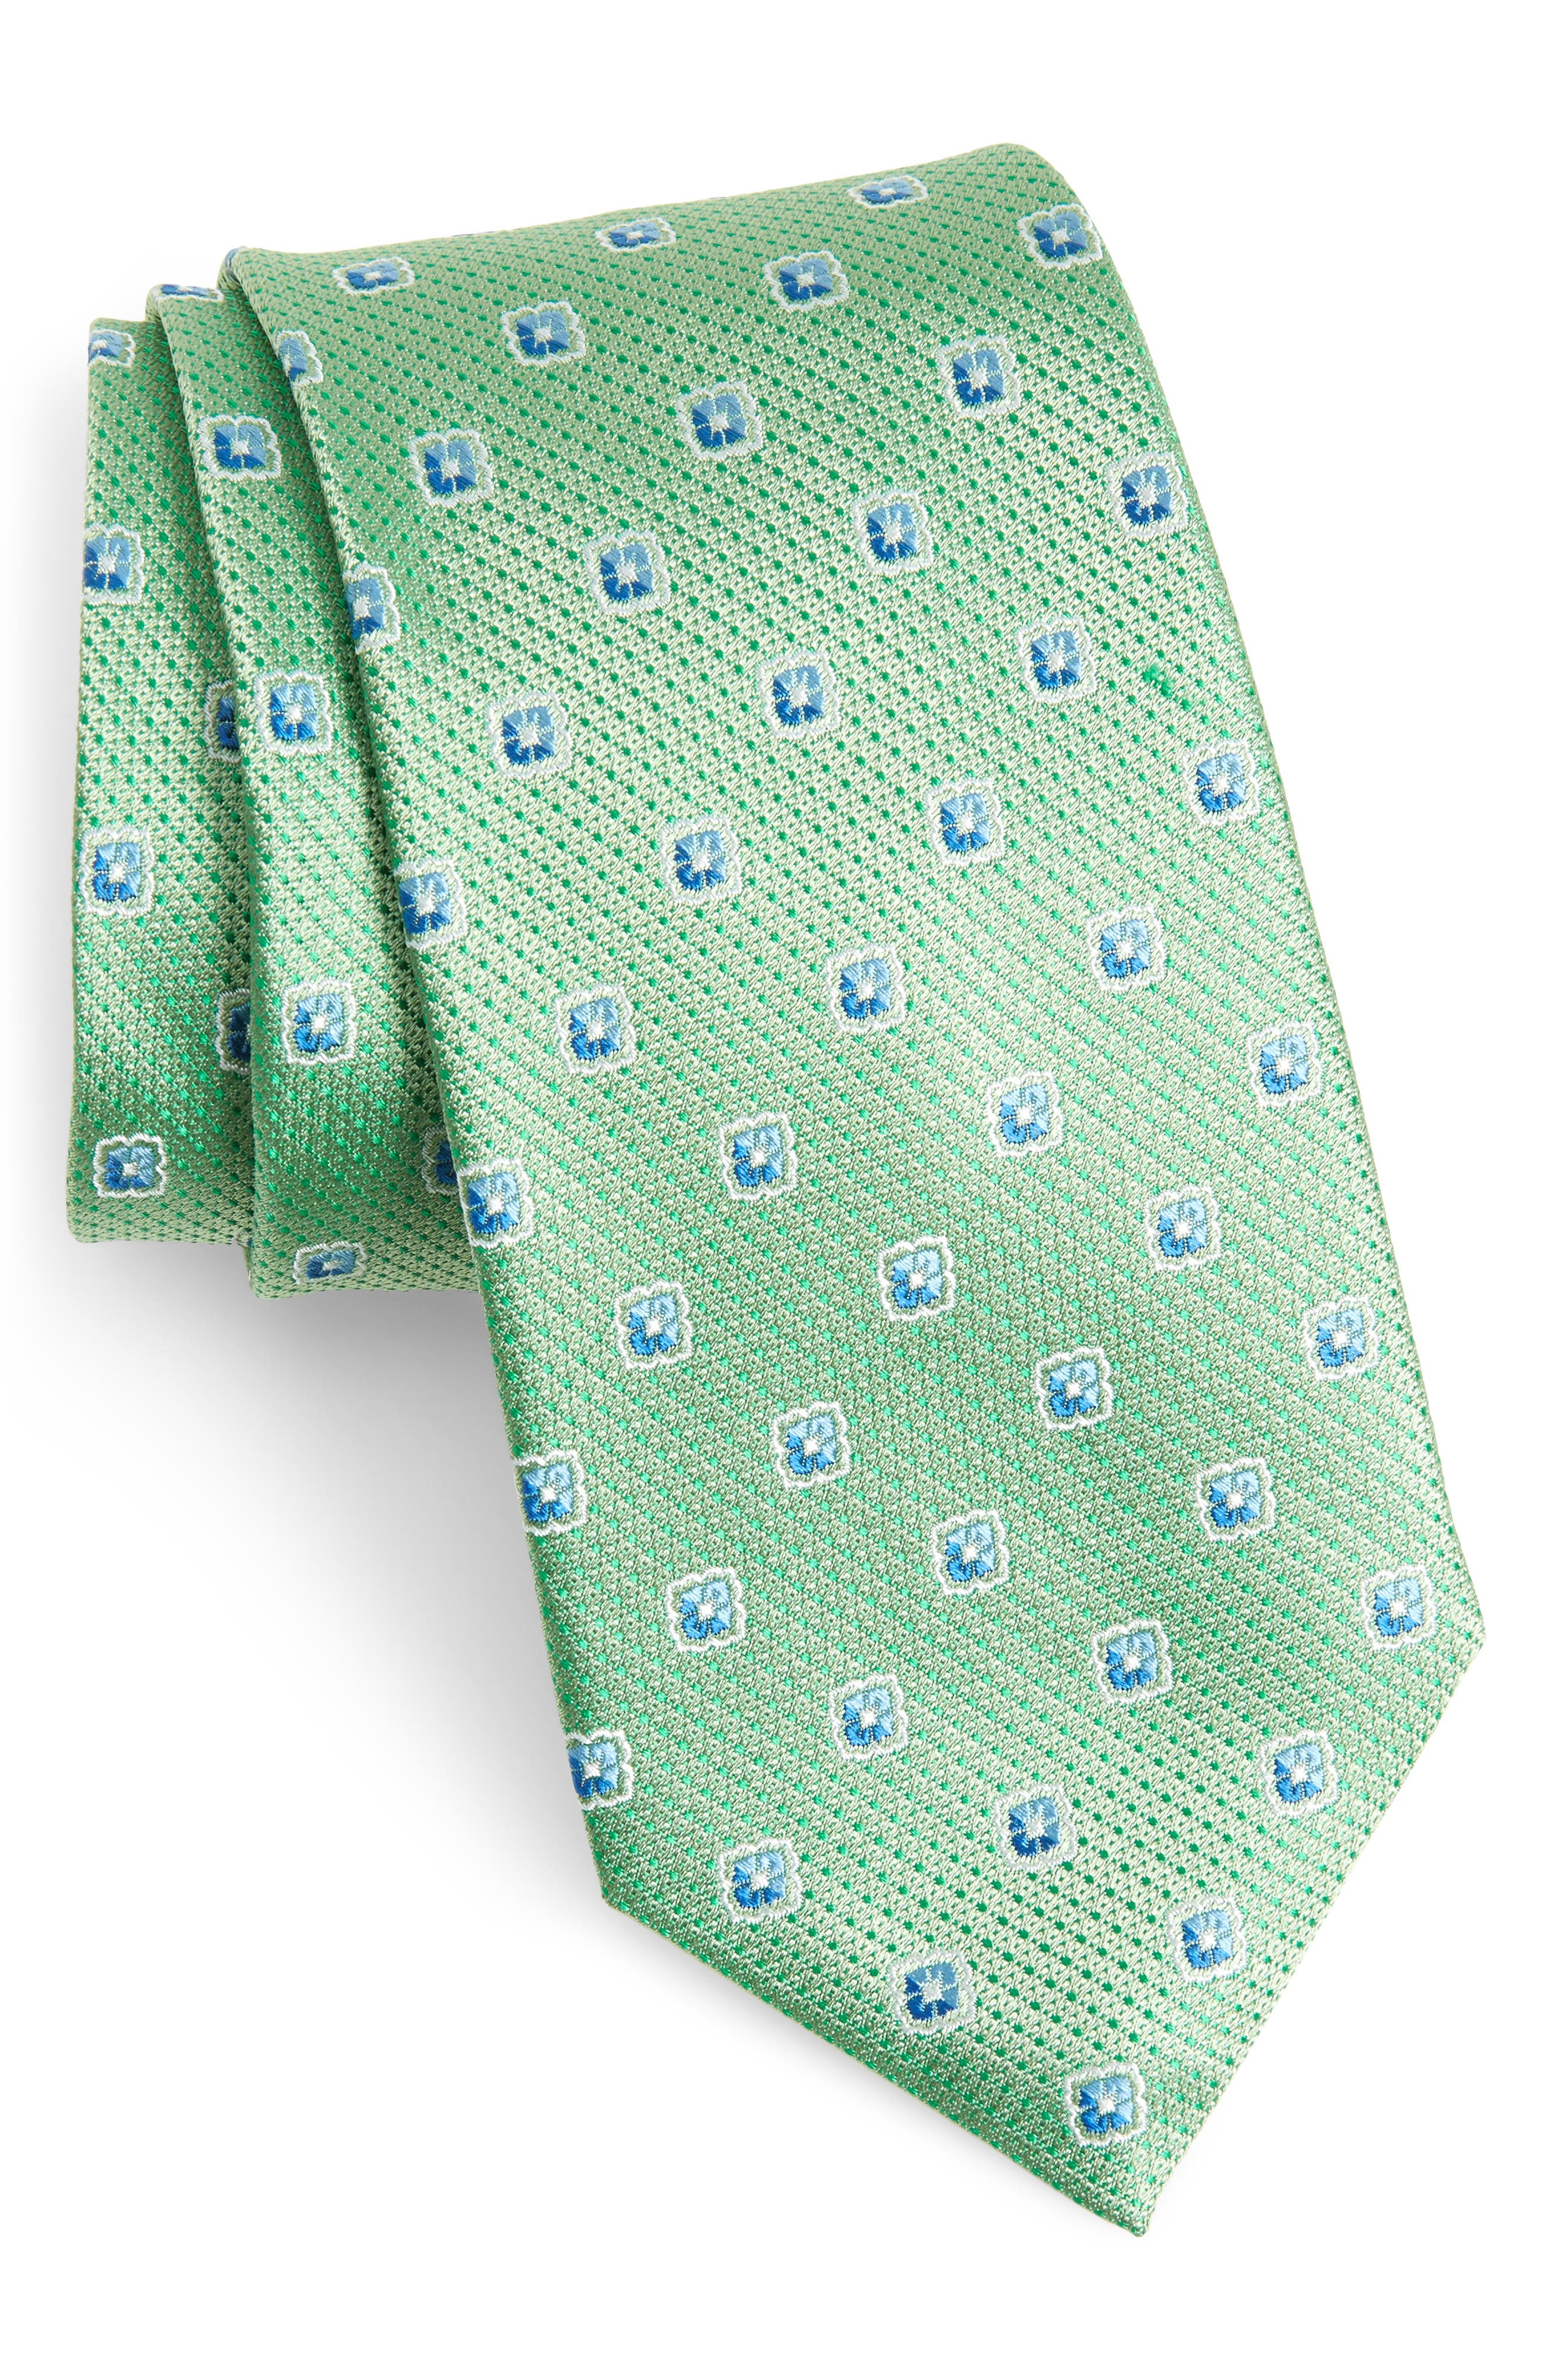 Leary Medallion Silk Tie,                             Main thumbnail 1, color,